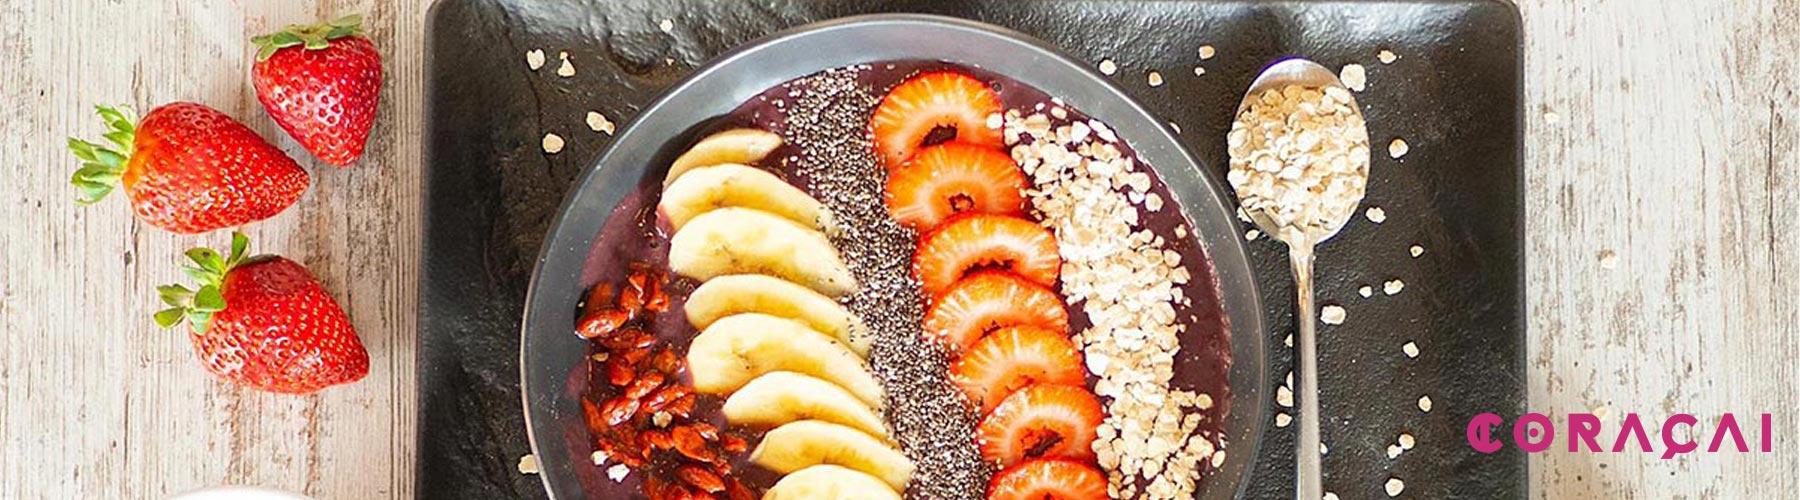 açai bowl receta desayuno